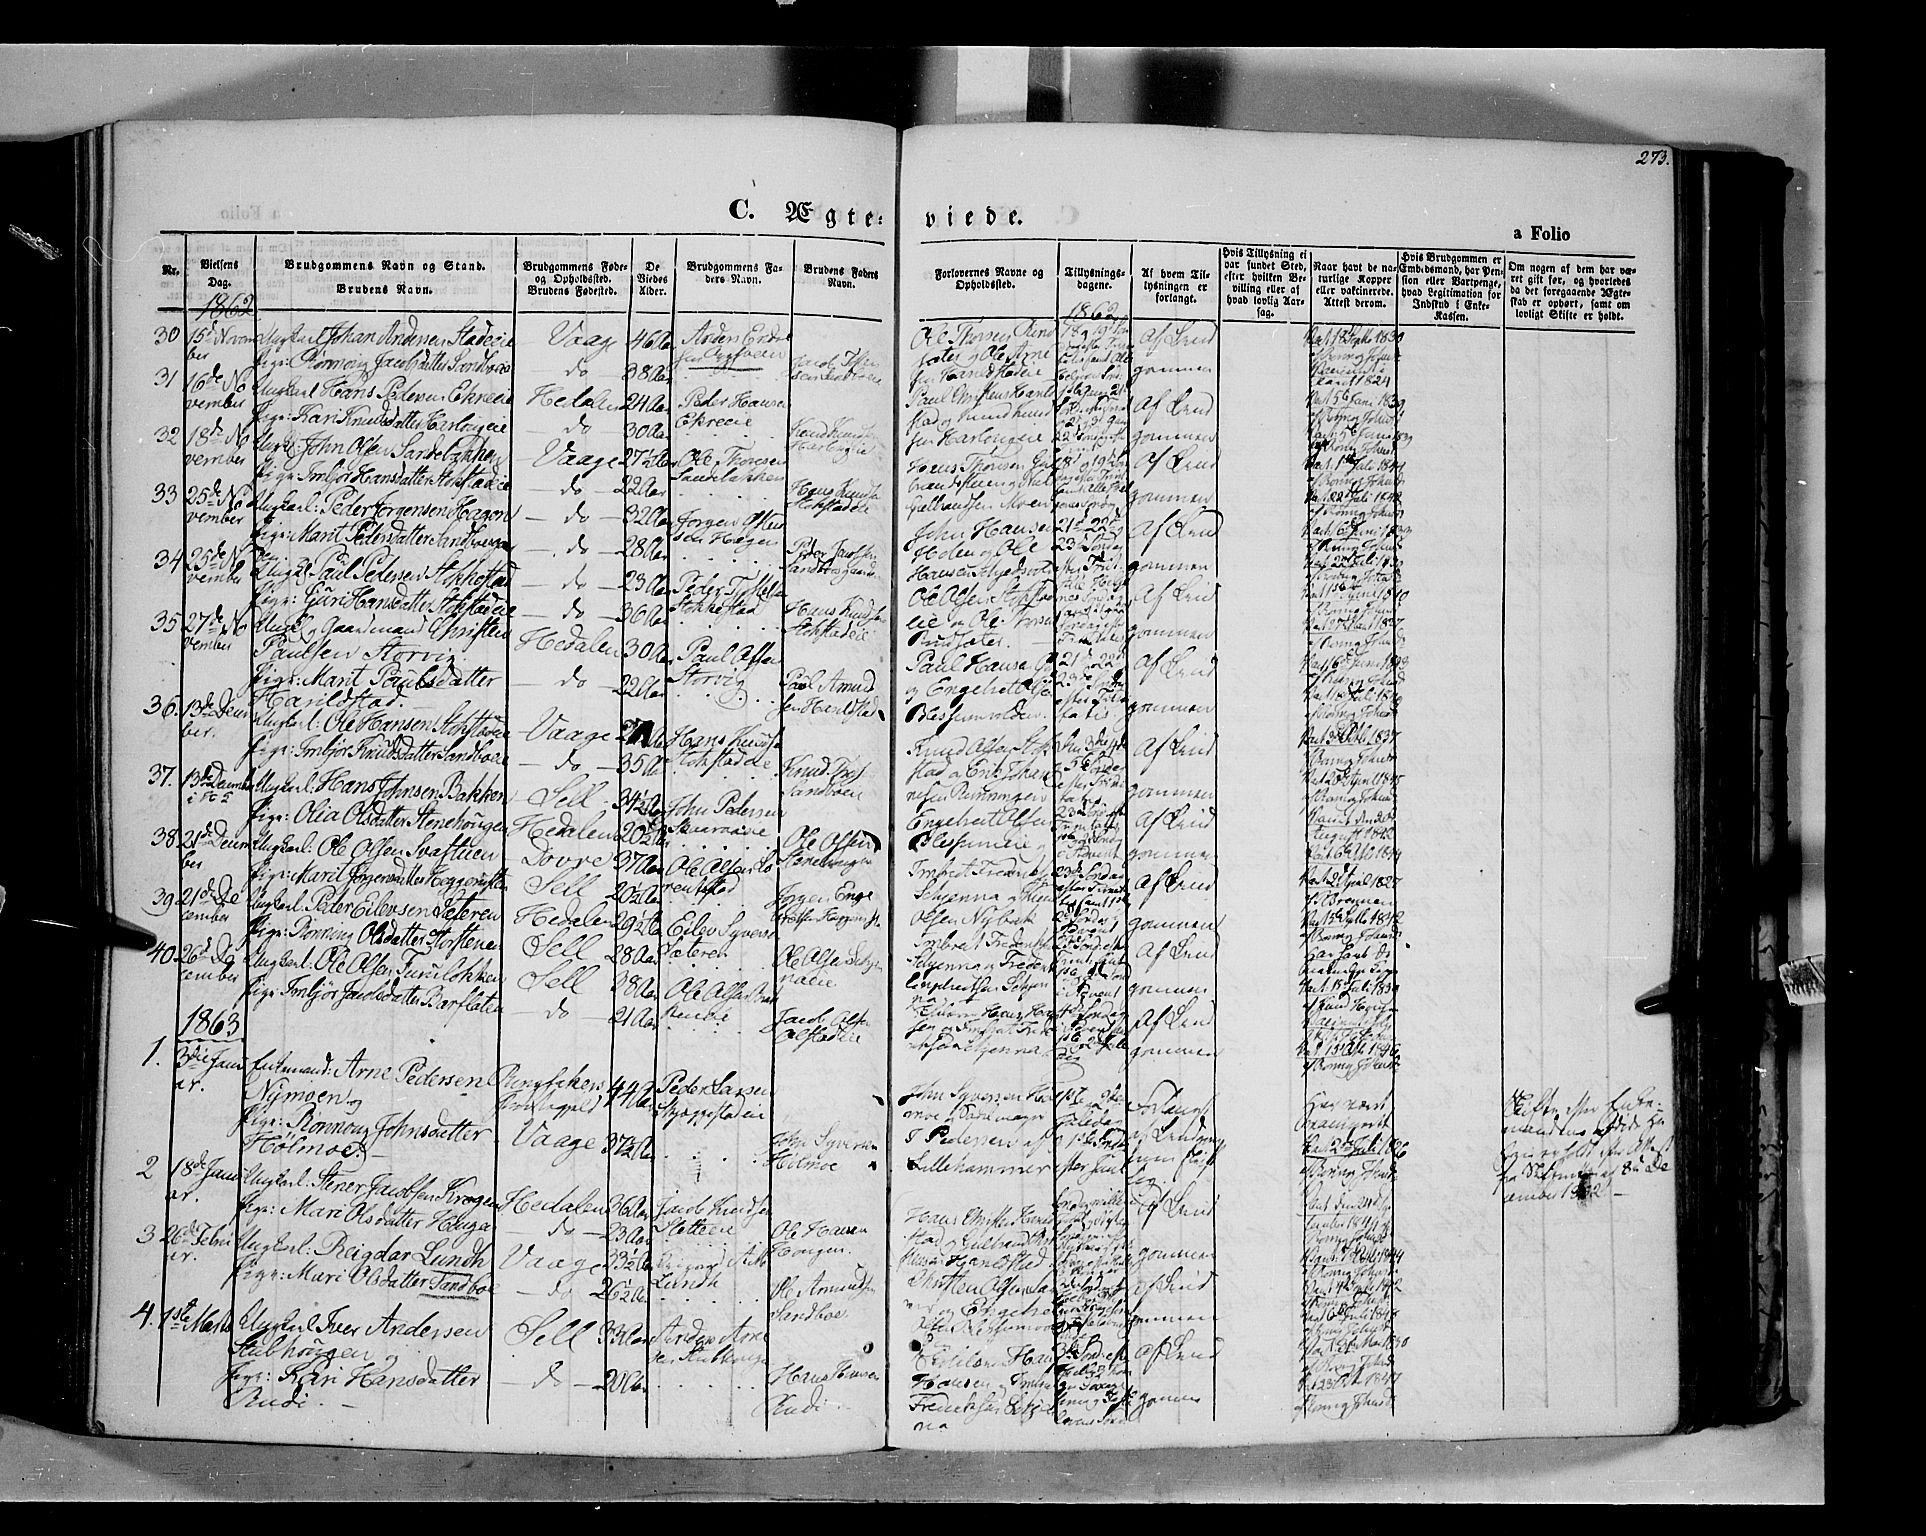 SAH, Vågå prestekontor, Ministerialbok nr. 6 /1, 1856-1872, s. 273